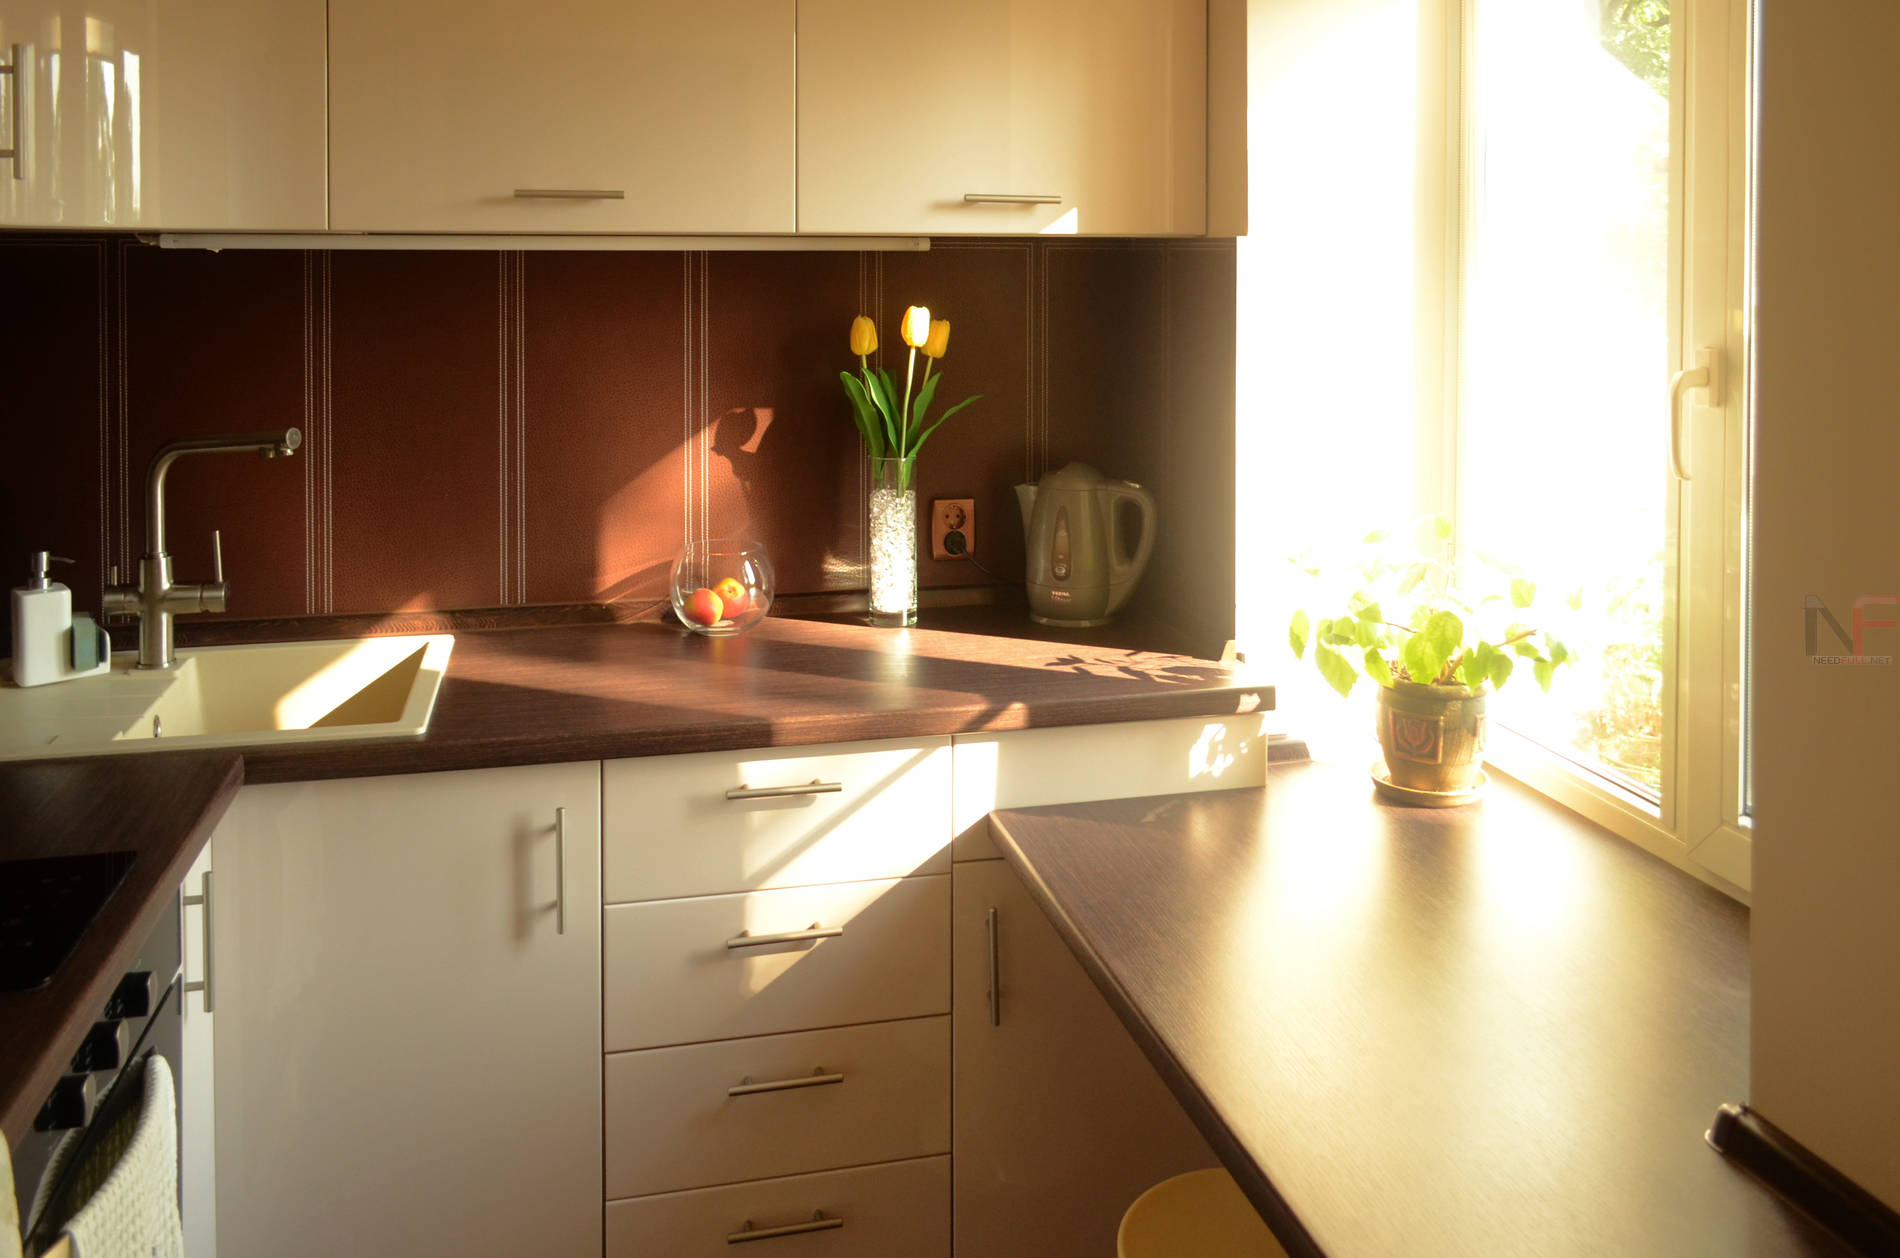 Как сделать подоконник на кухне фото 589